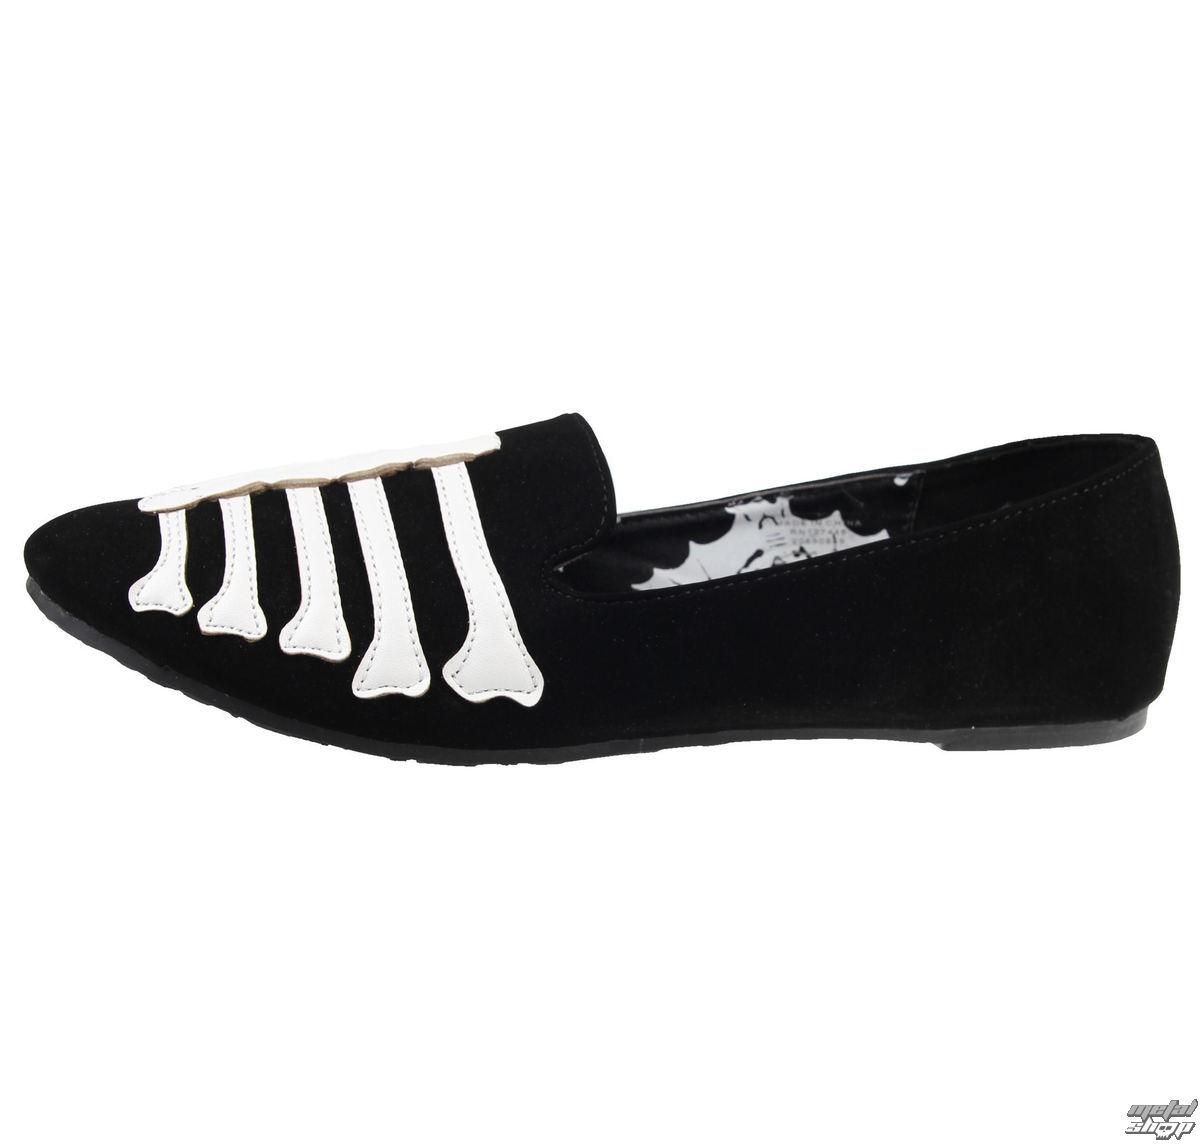 boty dámské (baleriny) IRON FIST - Wishbone Loafer Flat - Black - IFW004394